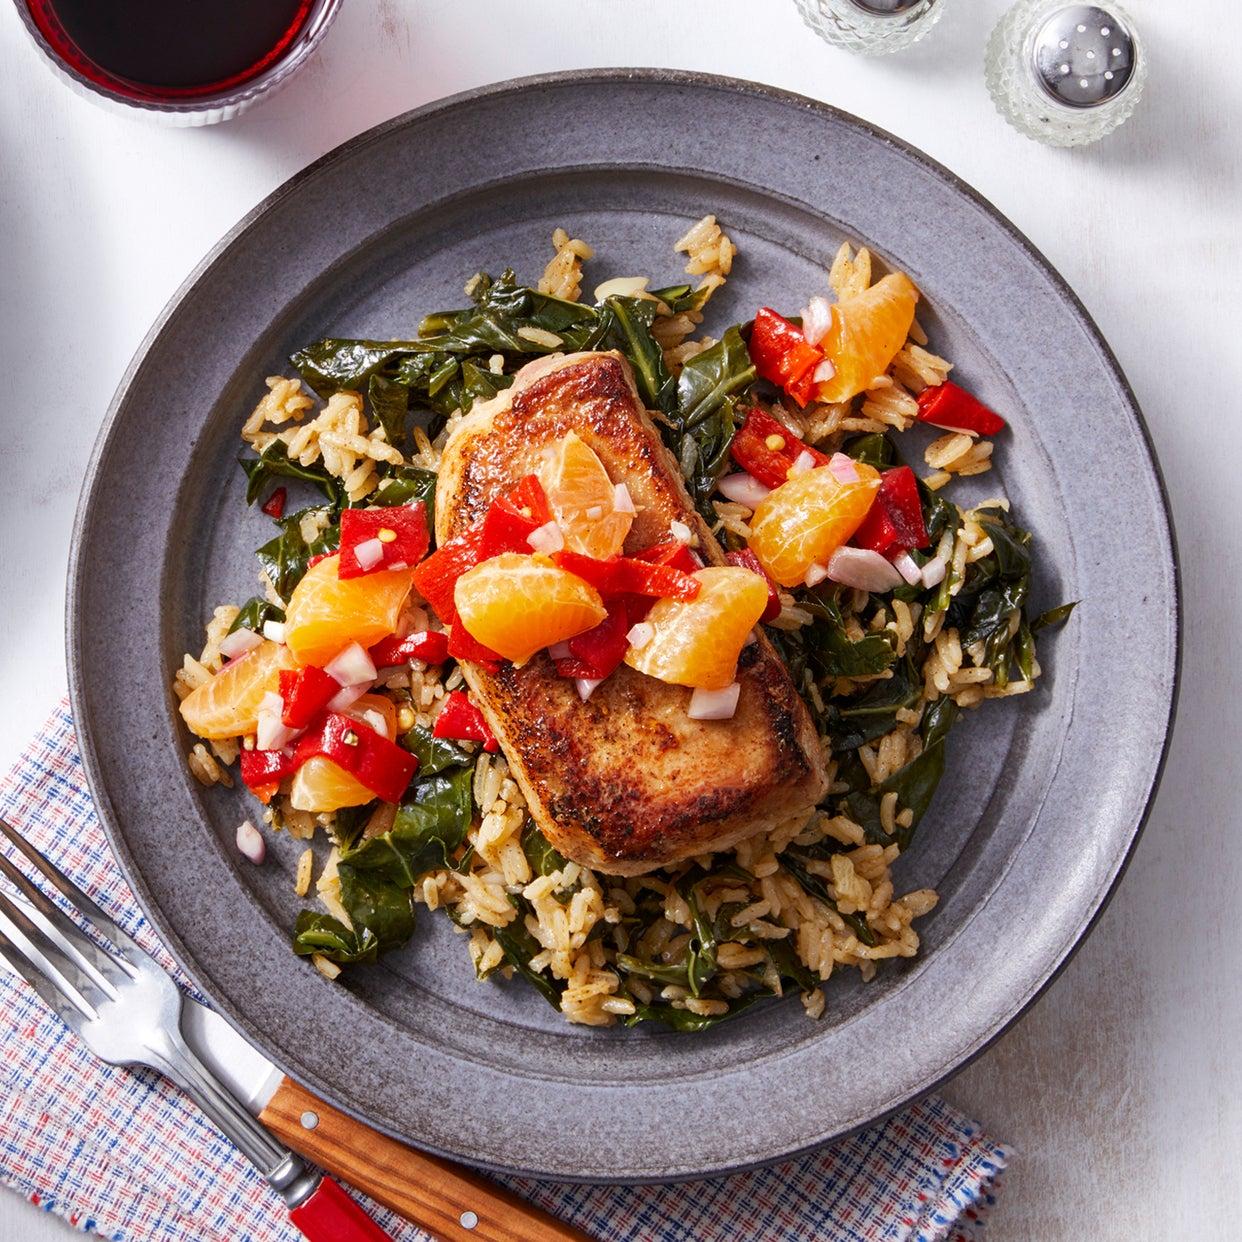 Southern Pork Chops with Collard Green Rice & Clementine Salsa